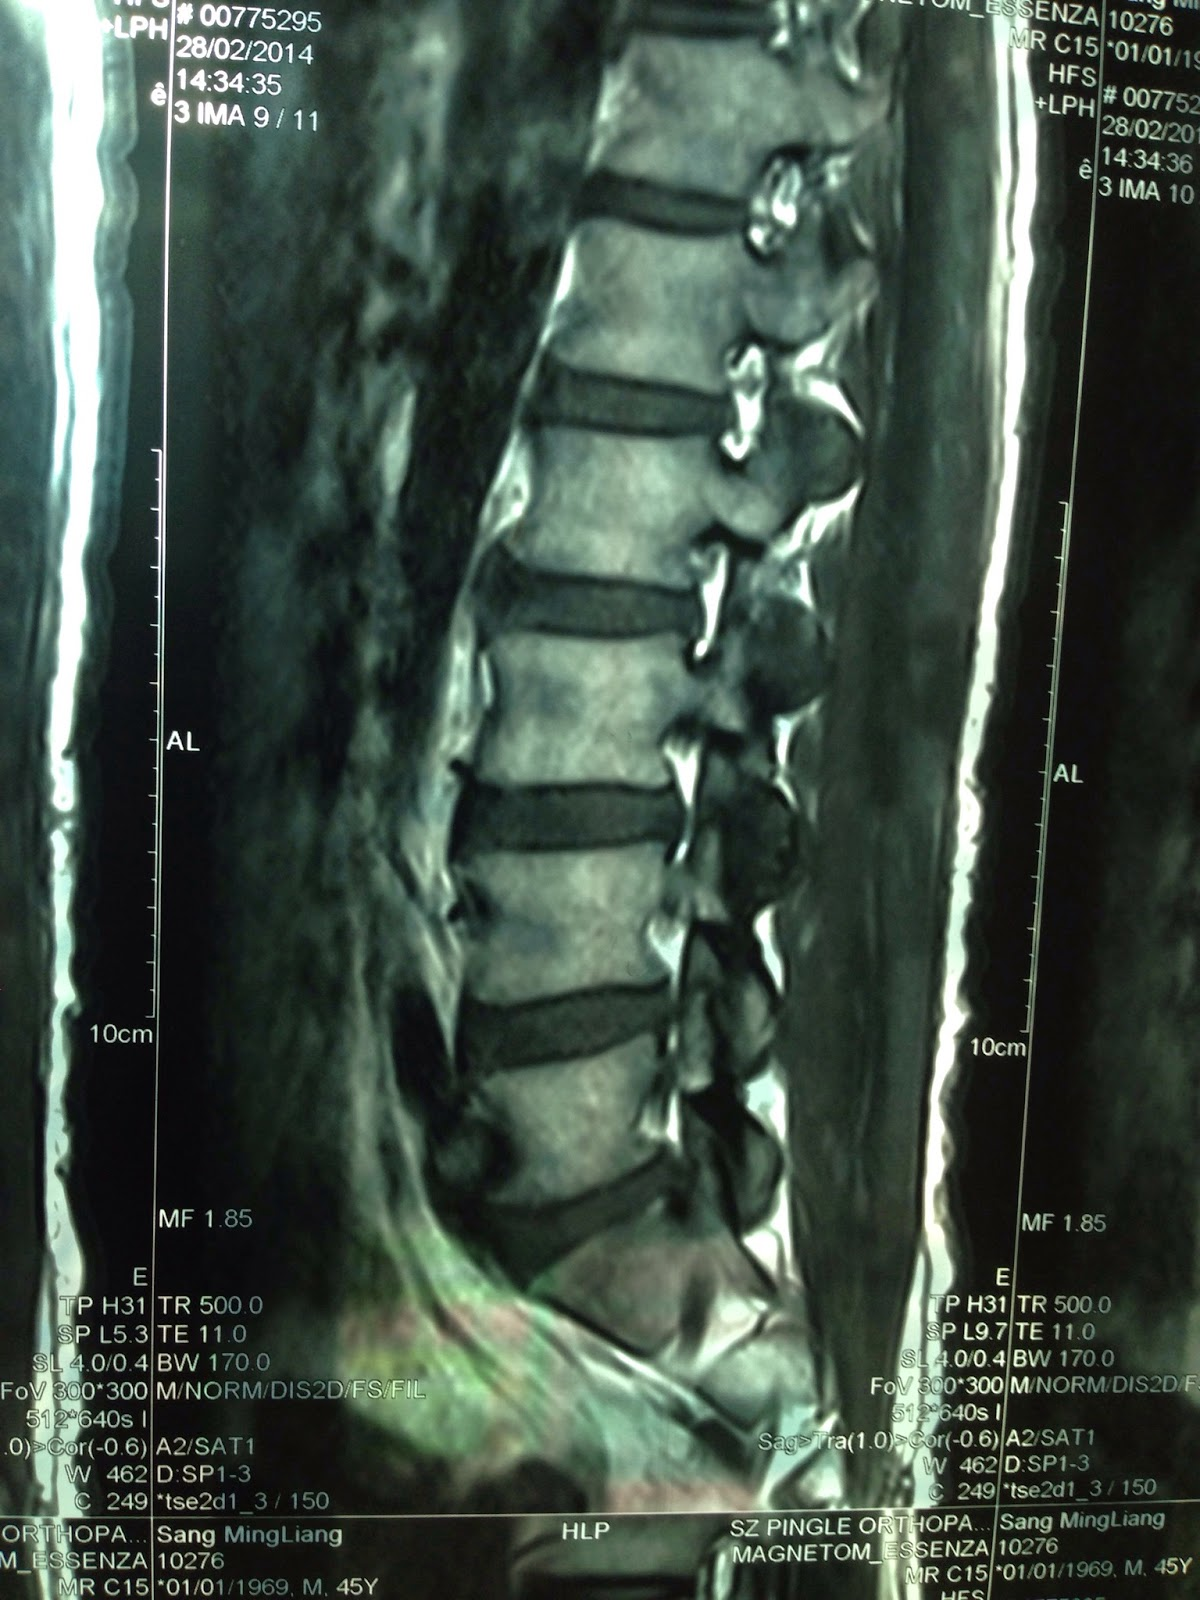 AKA博田法2回目と痛みの原因 | 腰椎椎間板ヘルニアと坐骨神経痛 ...